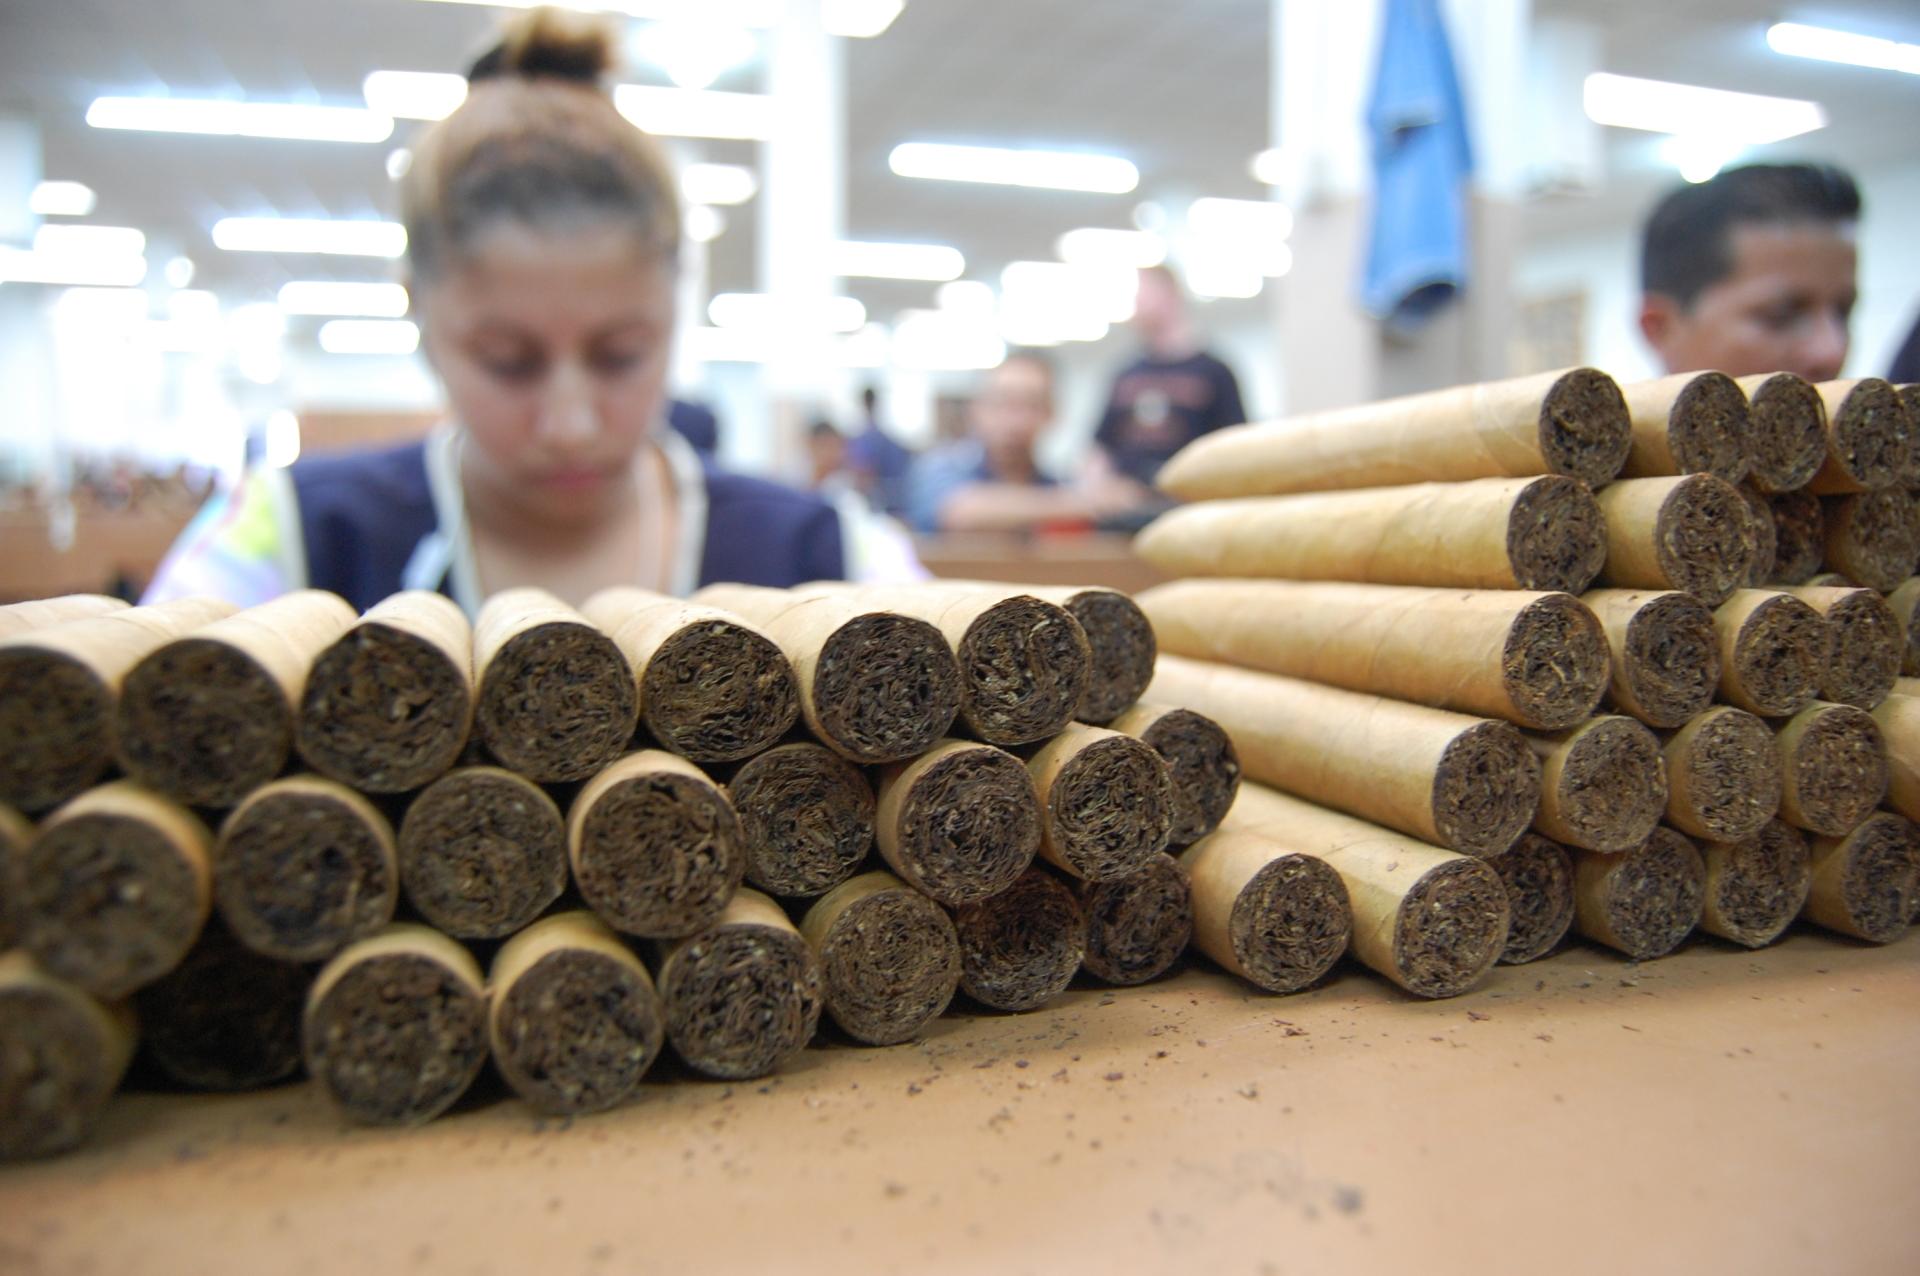 Fresh freshly hand rolled cigars